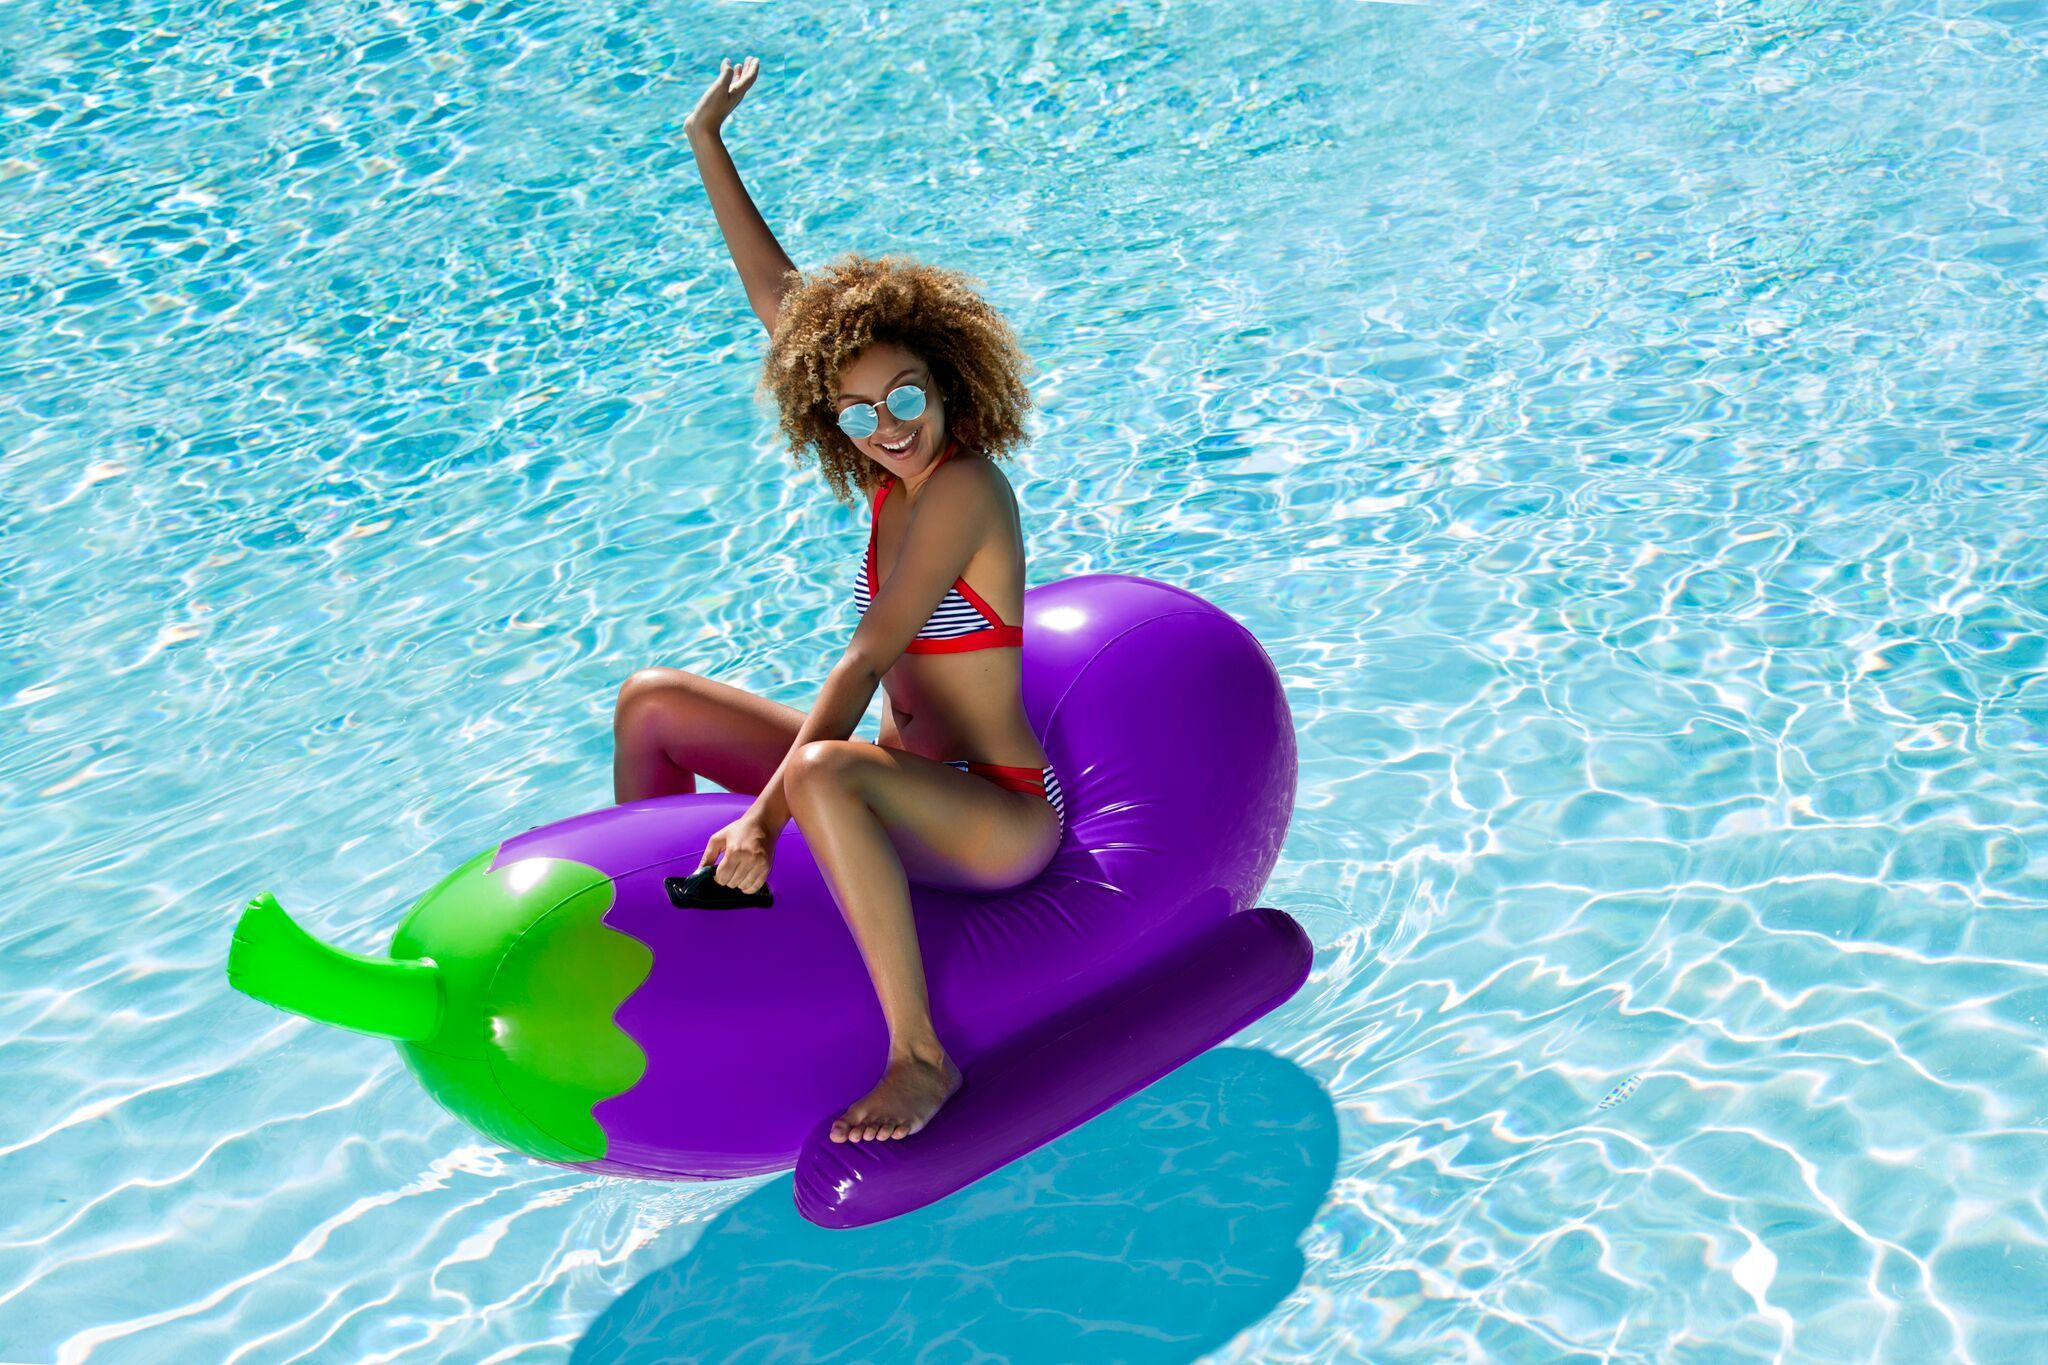 Giant Eggplant Rider Emoji Pool Float | Bouée Piscine ... concernant Animaux Gonflable Pour Piscine